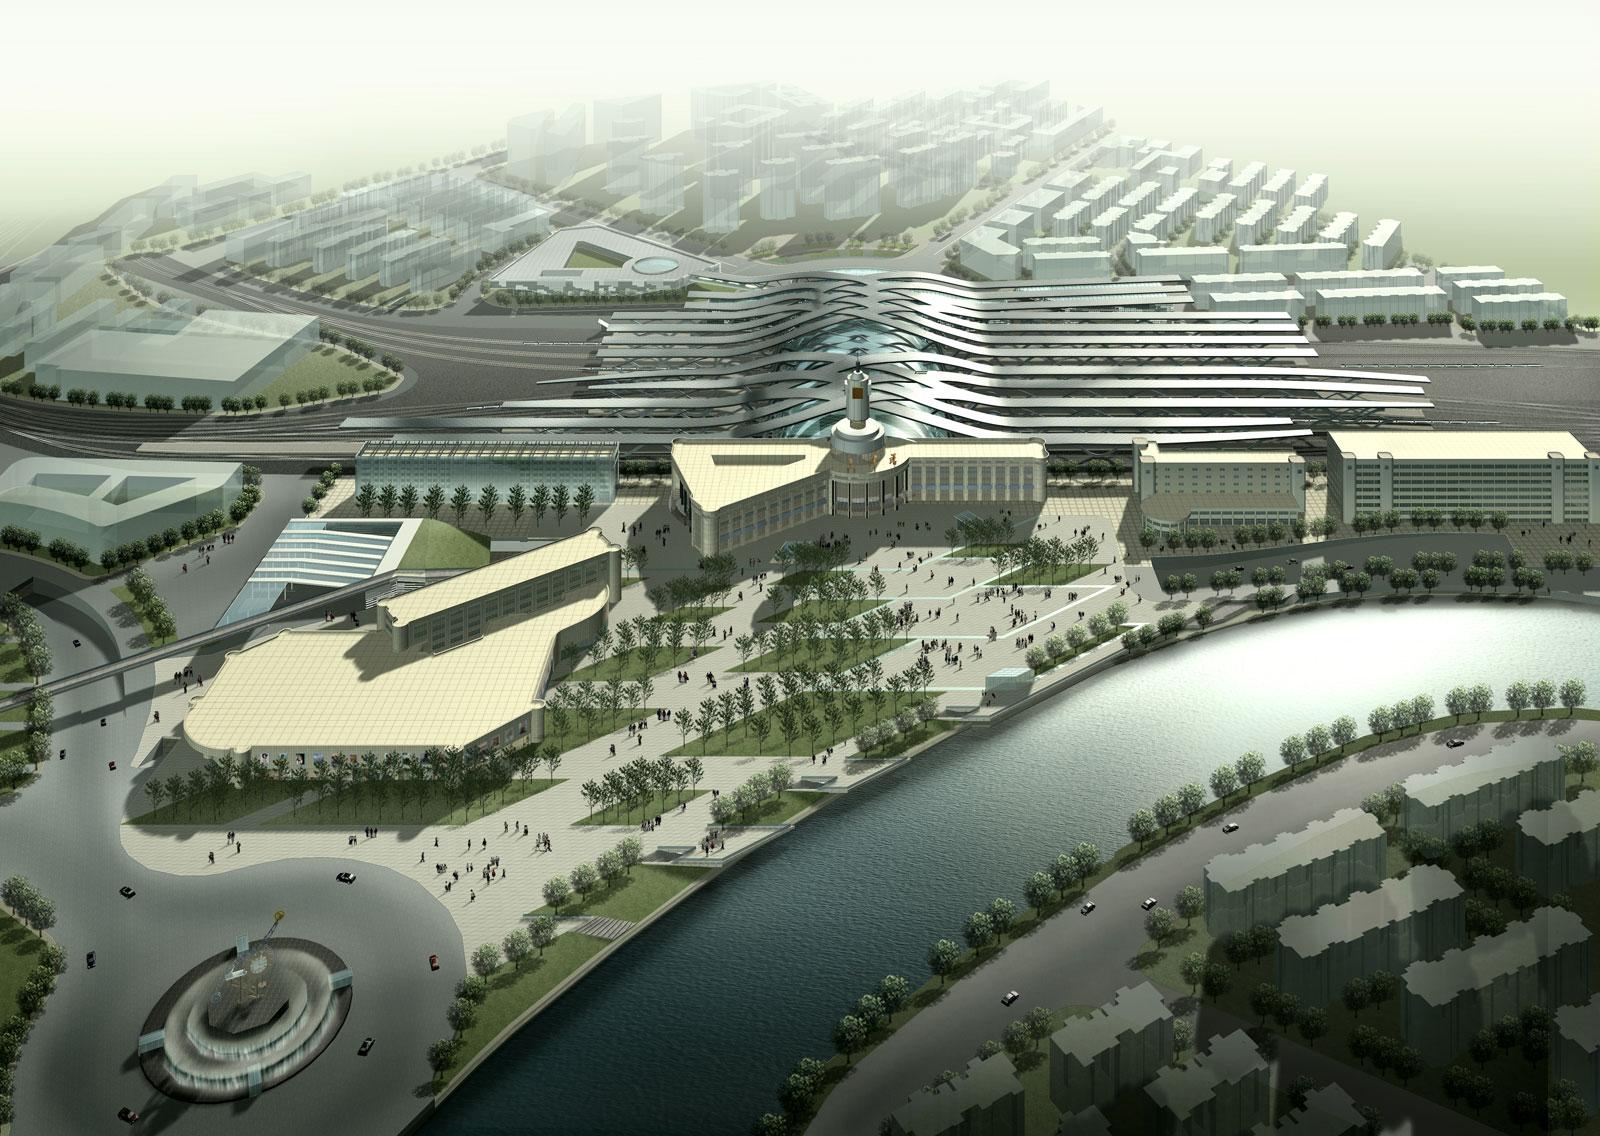 RR Station, Tianjin, China / by de Architekten Cie.